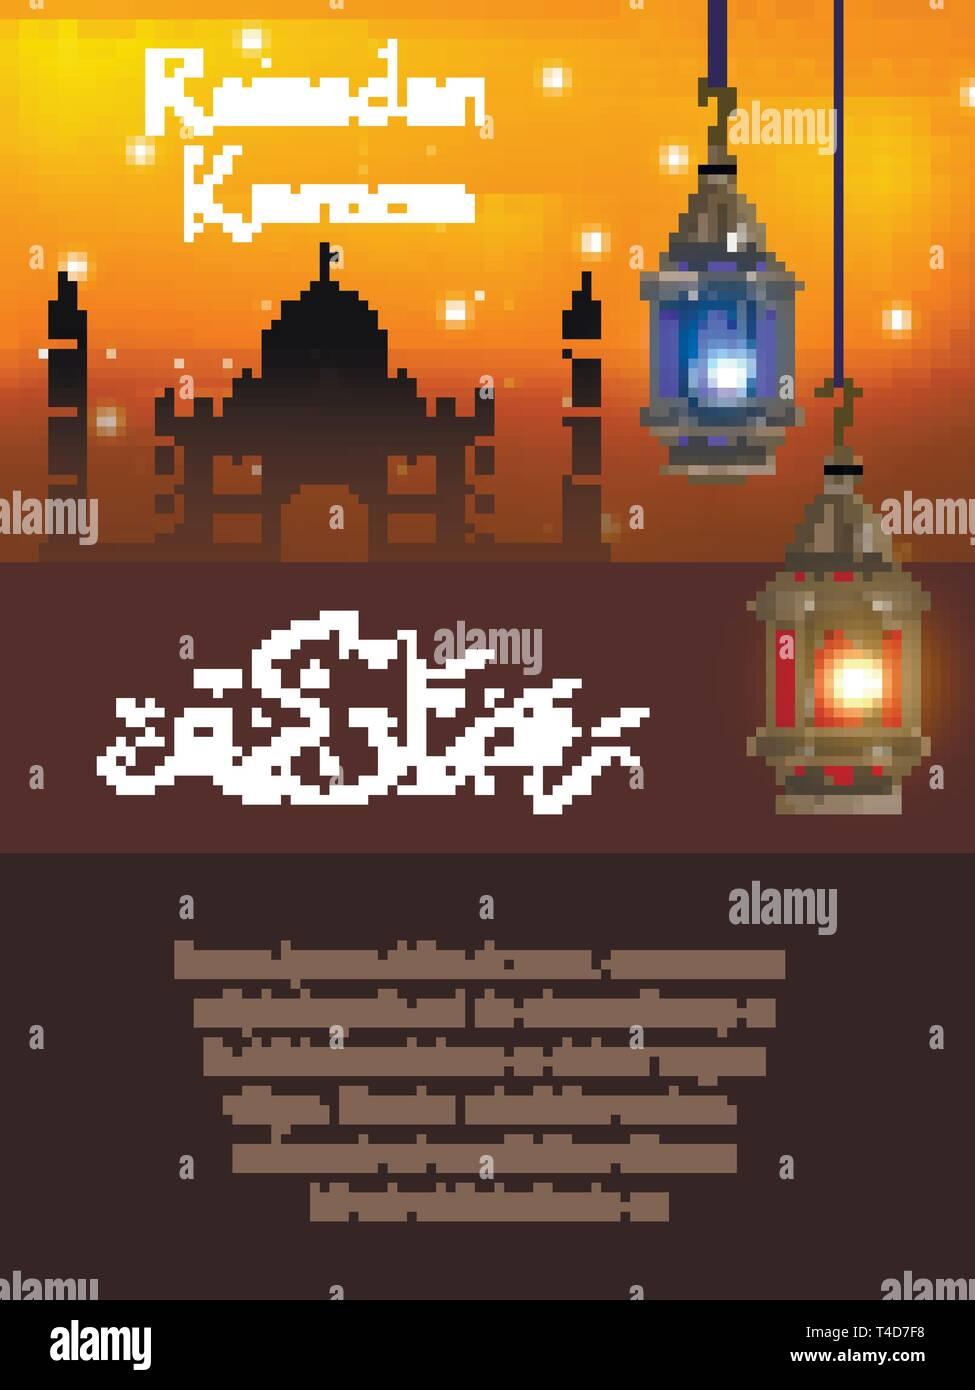 Ramadan Kareem Tarjeta De Felicitación Con Linternas